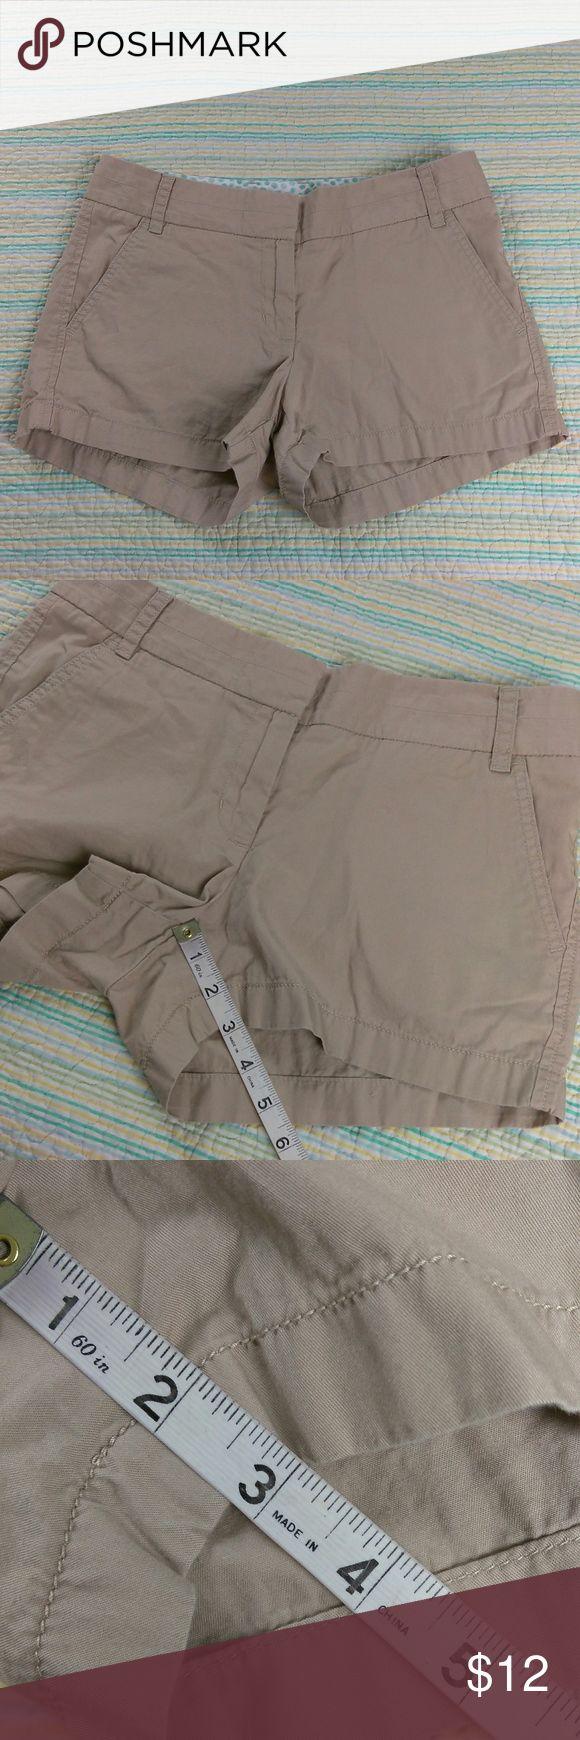 "J Crew Sz 2 Khaki 3"" Chino Broken-In Casual Shorts J Crew Women's Sz 2 Khaki 3"" Chino Broken-In Casual Cotton Shorts J. Crew Shorts"